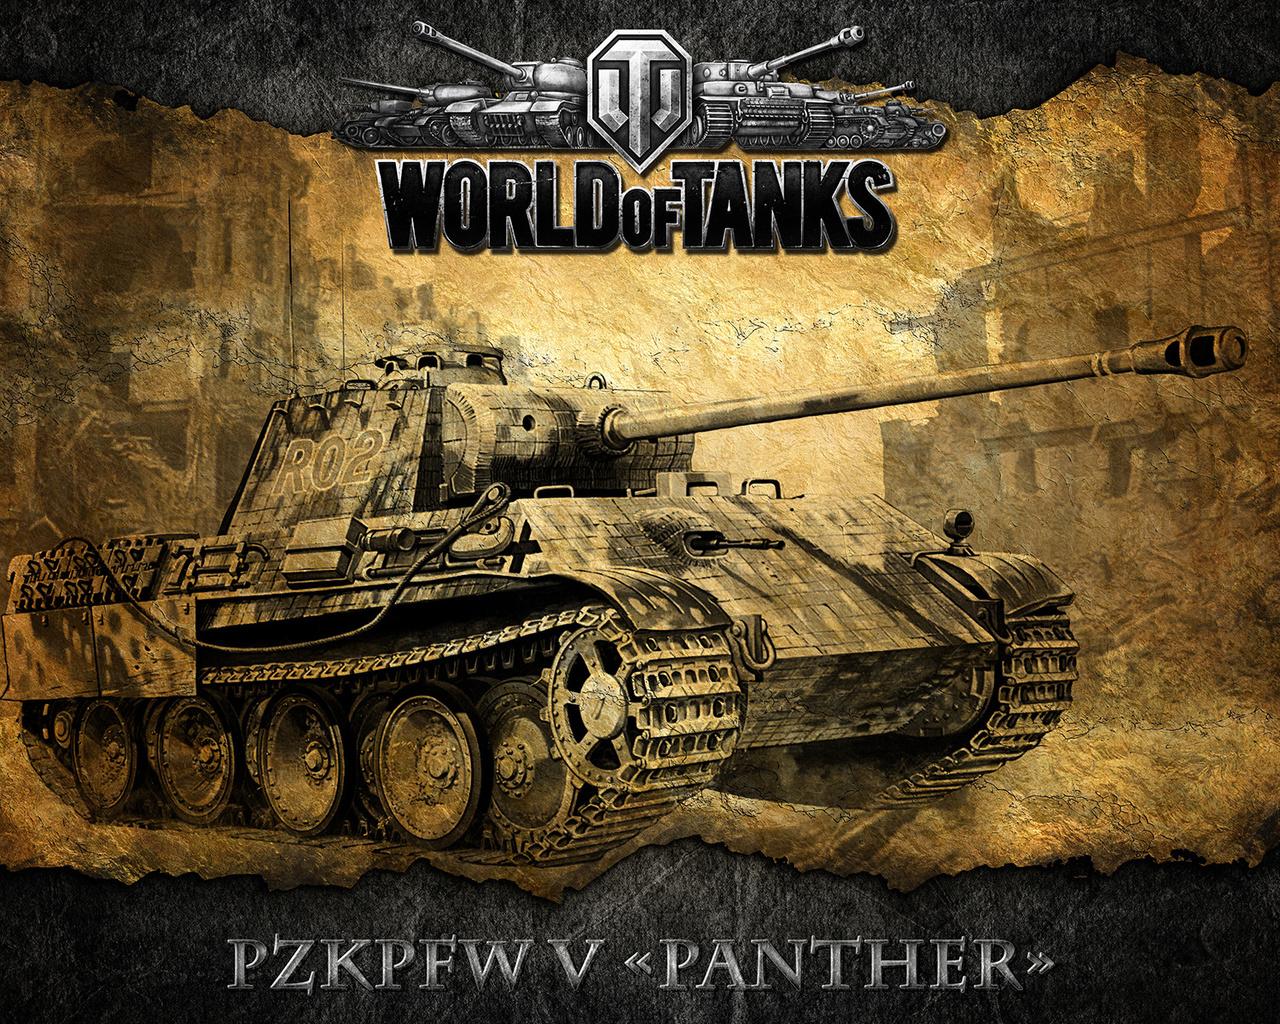 wot, немецкий, танк, World of tanks, pzkpfw v panther, мир танков, world of tanks,